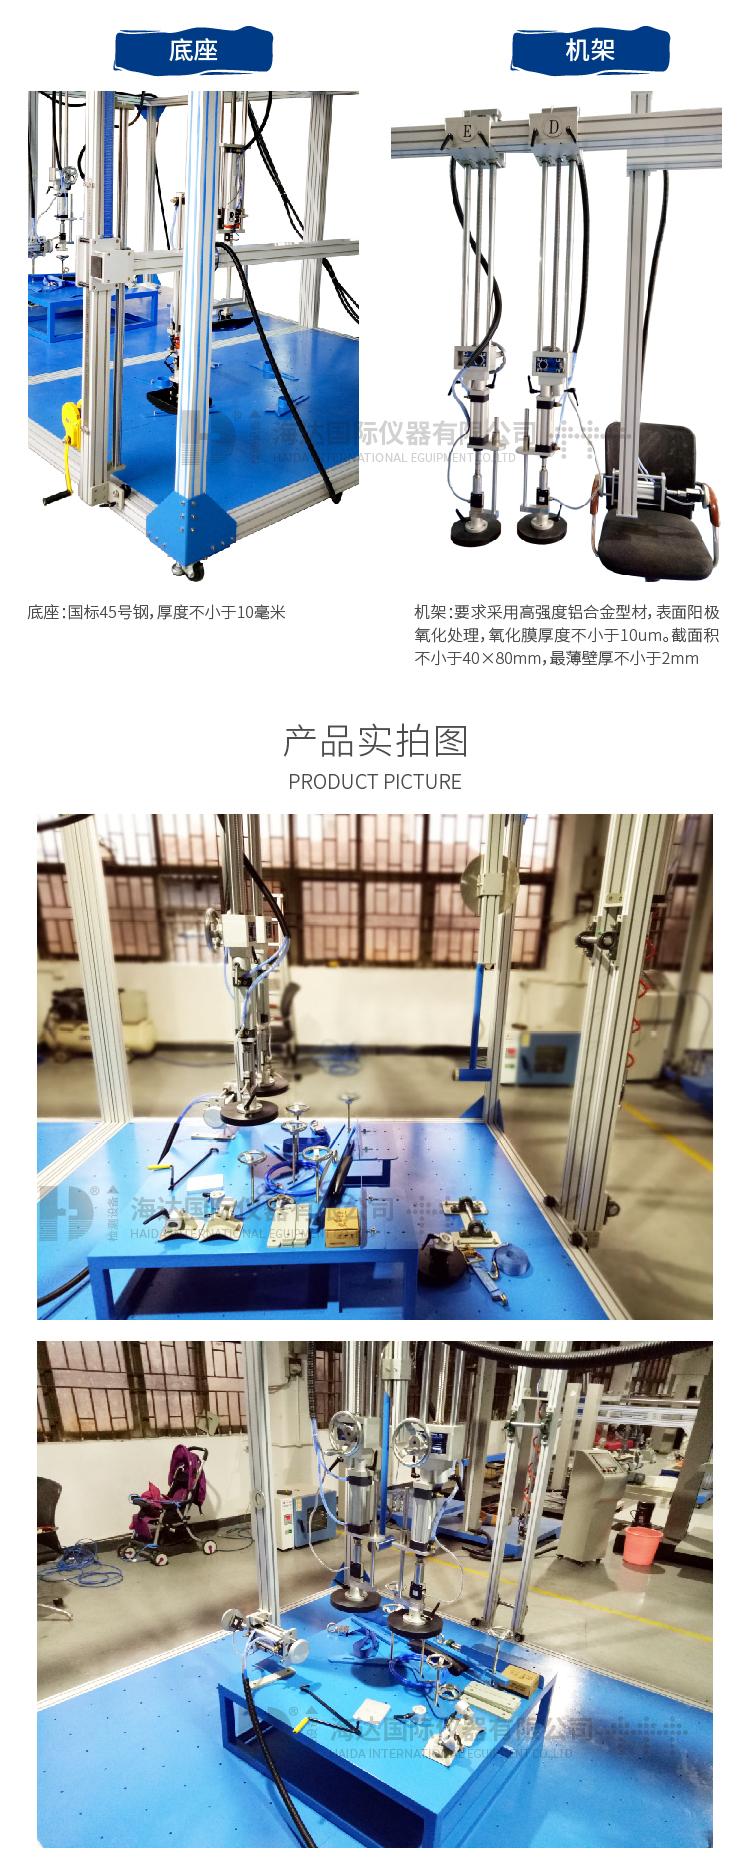 HD-F738 椅子综合测试仪_04.jpg